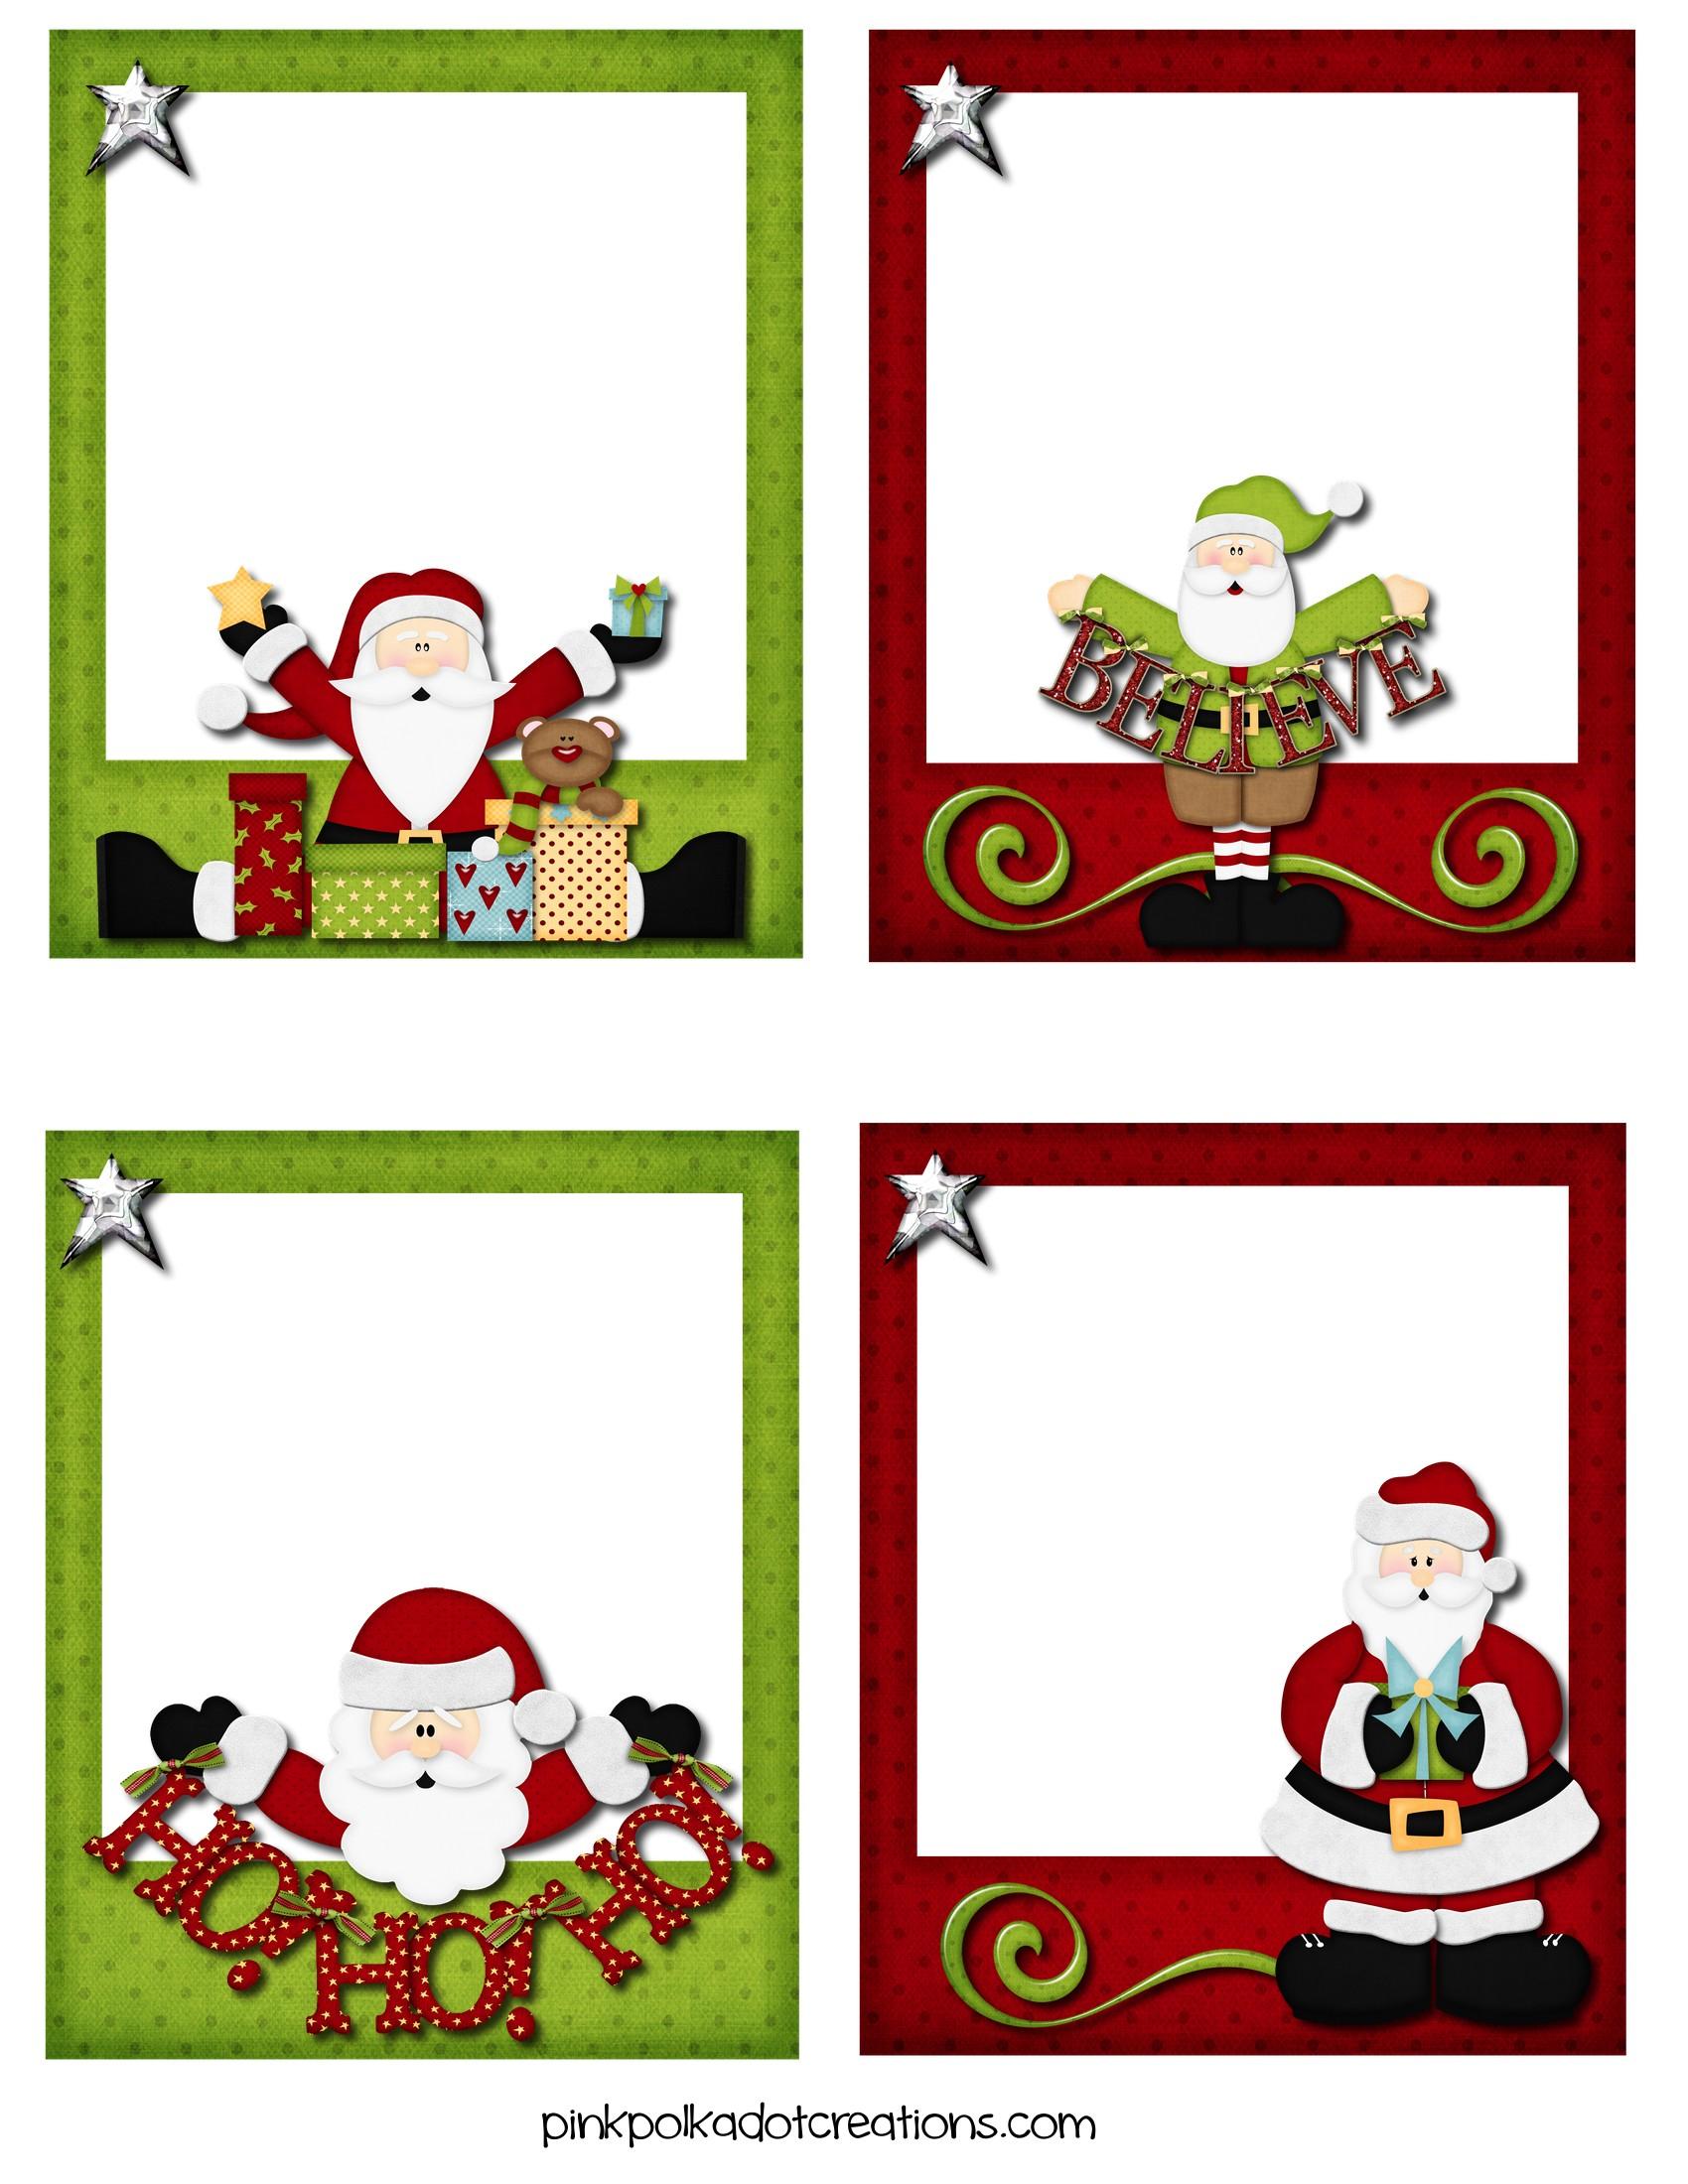 photograph regarding Christmas Labels Printable called MMs Xmas Reward Label - Purple Polka Dot Creations